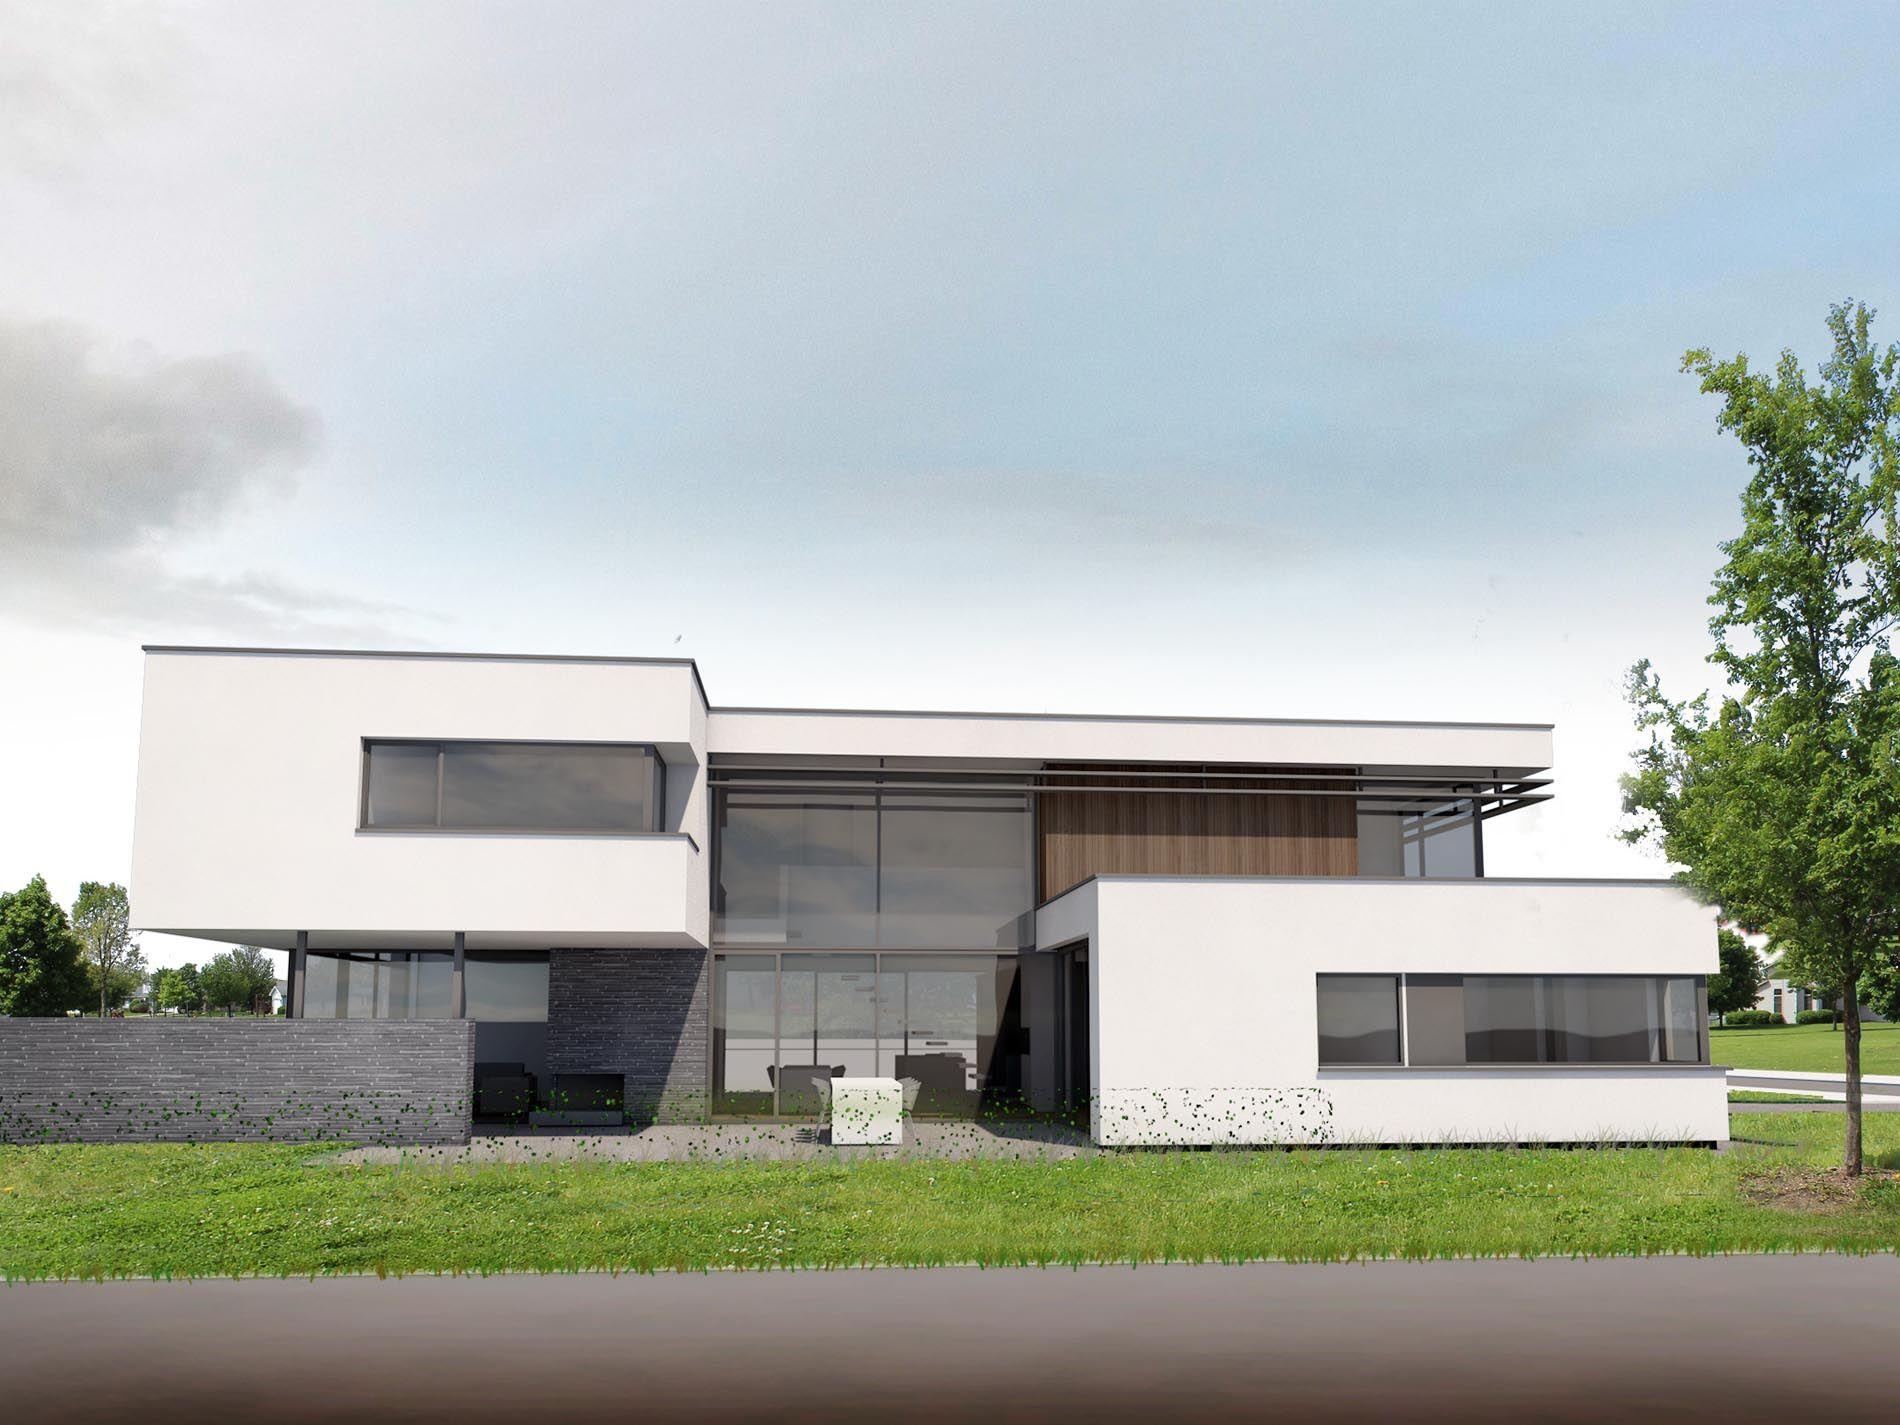 Maas architecten woonhuis rotterdam huis pinterest for Woonhuis rotterdam